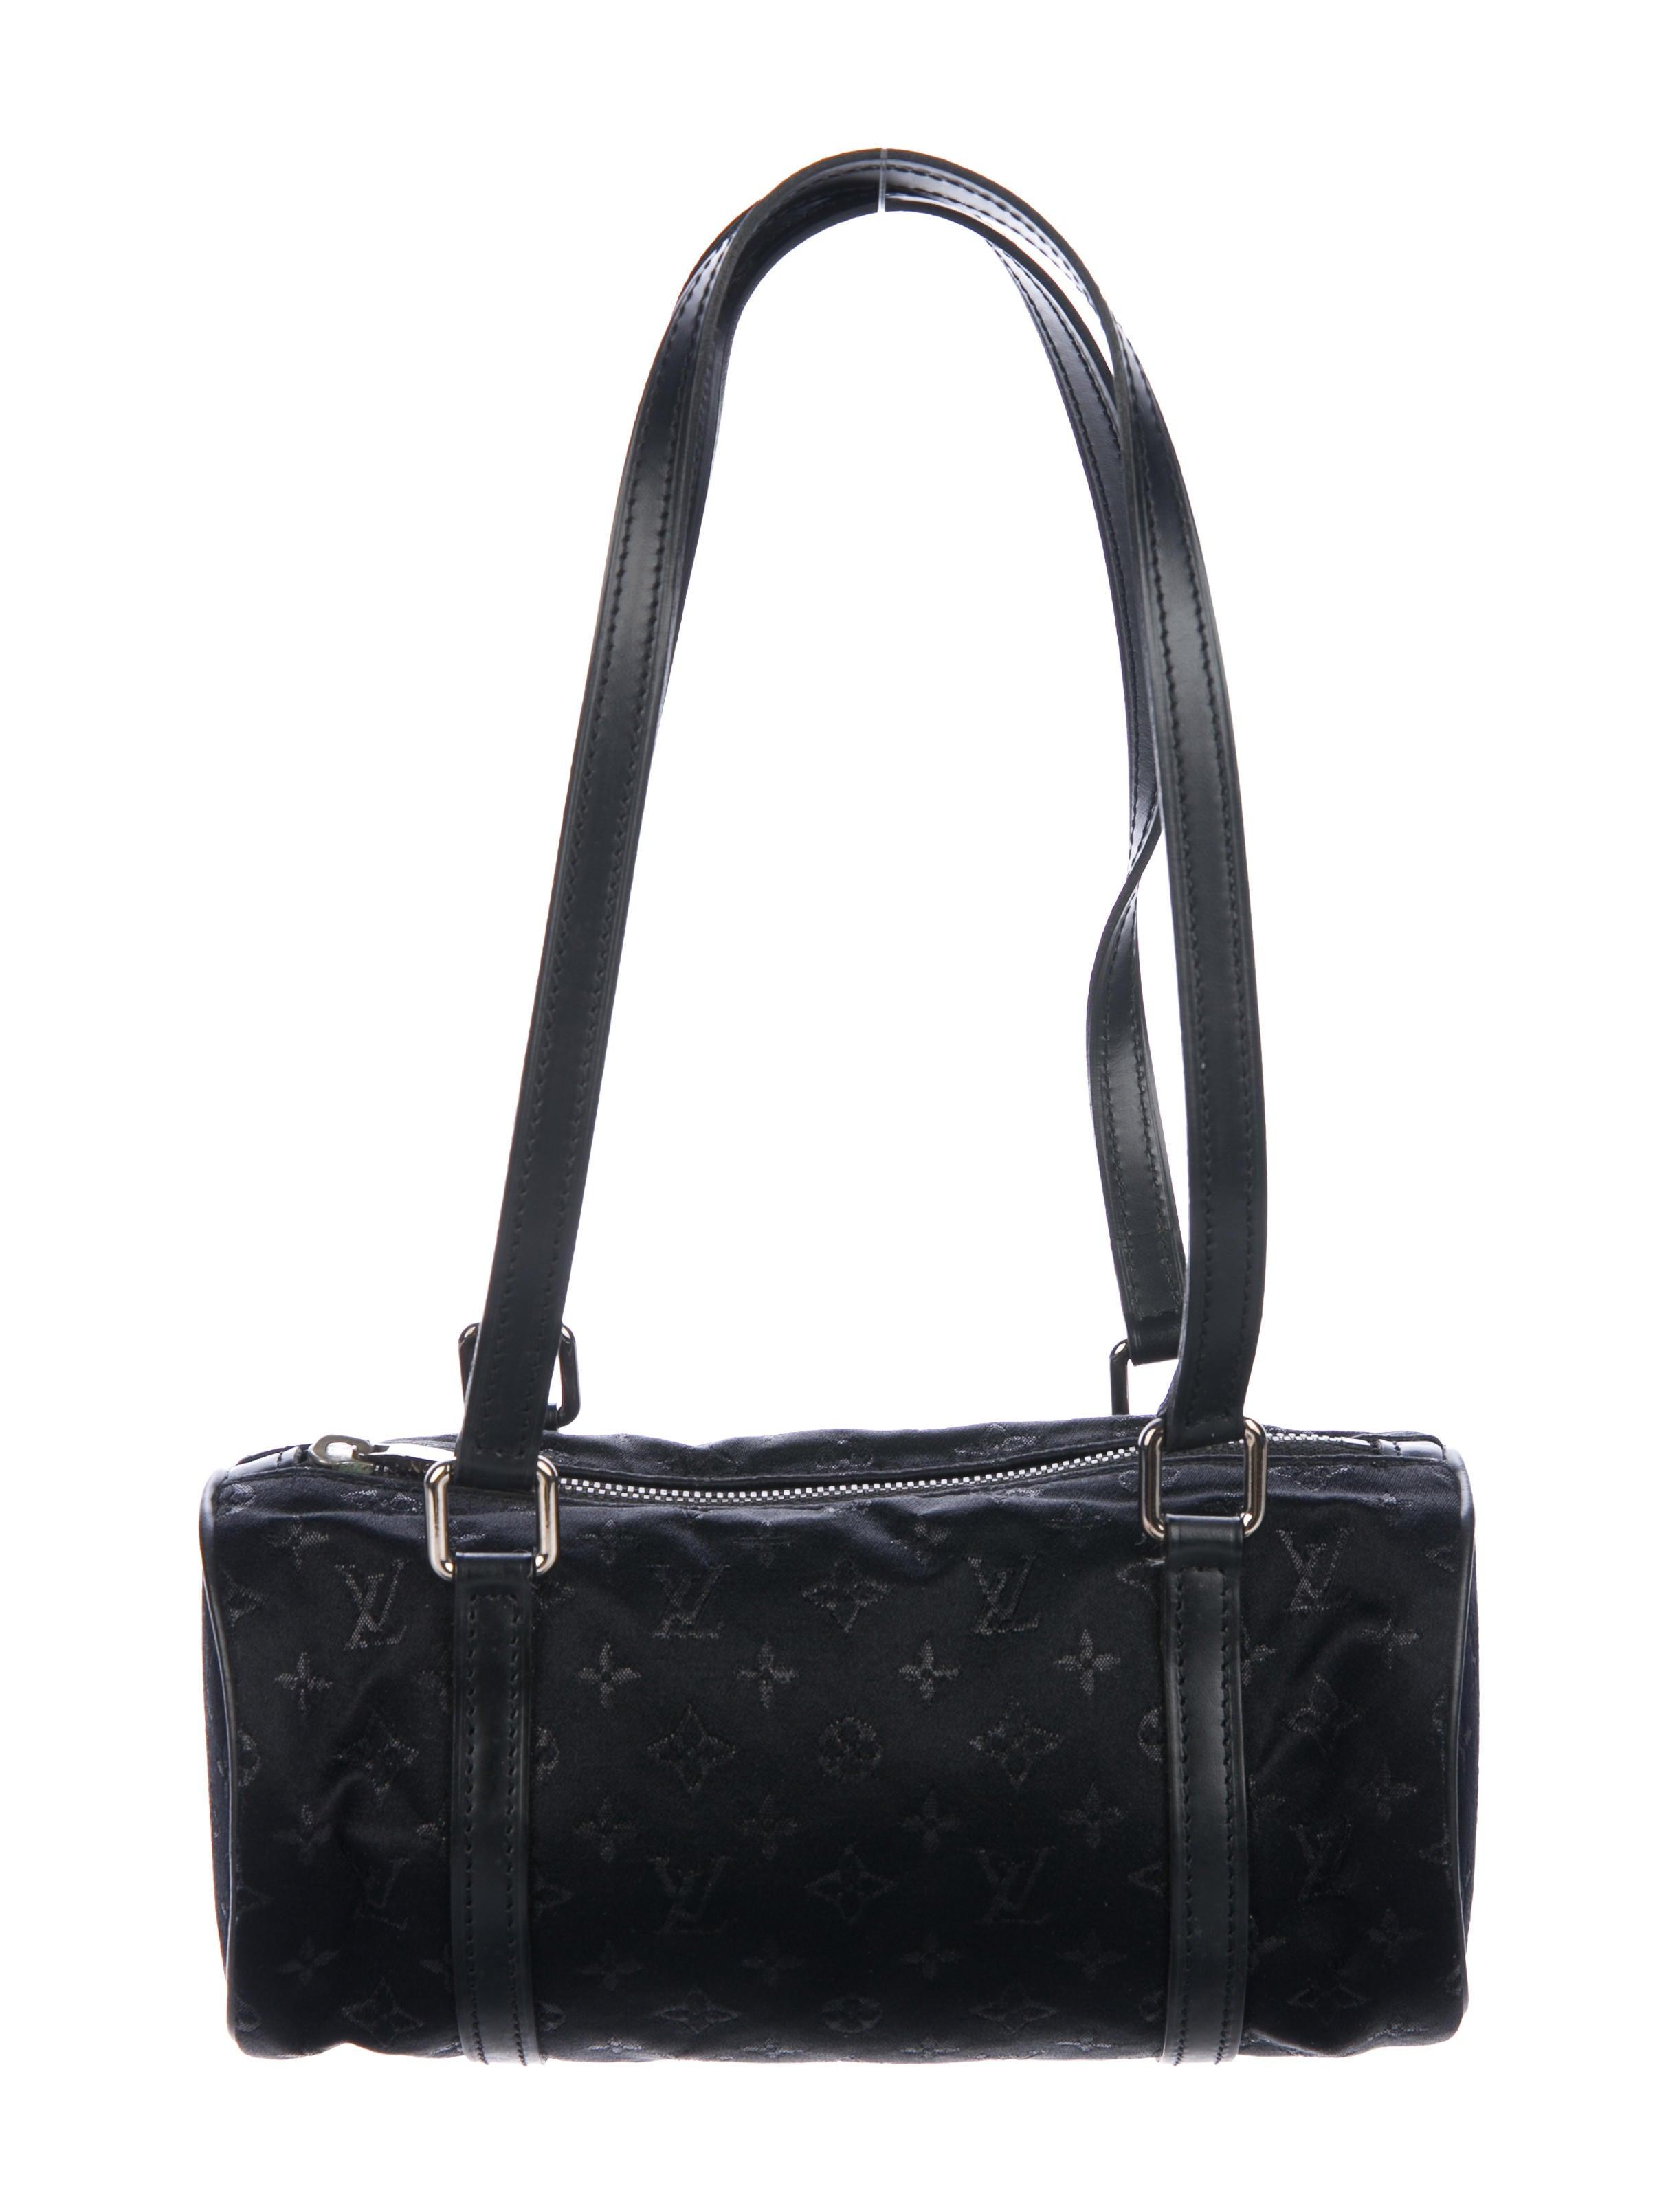 8ca7c41c4019 Louis Vuitton Monogram Satin Mini Papillon - Handbags - LOU164774 ...